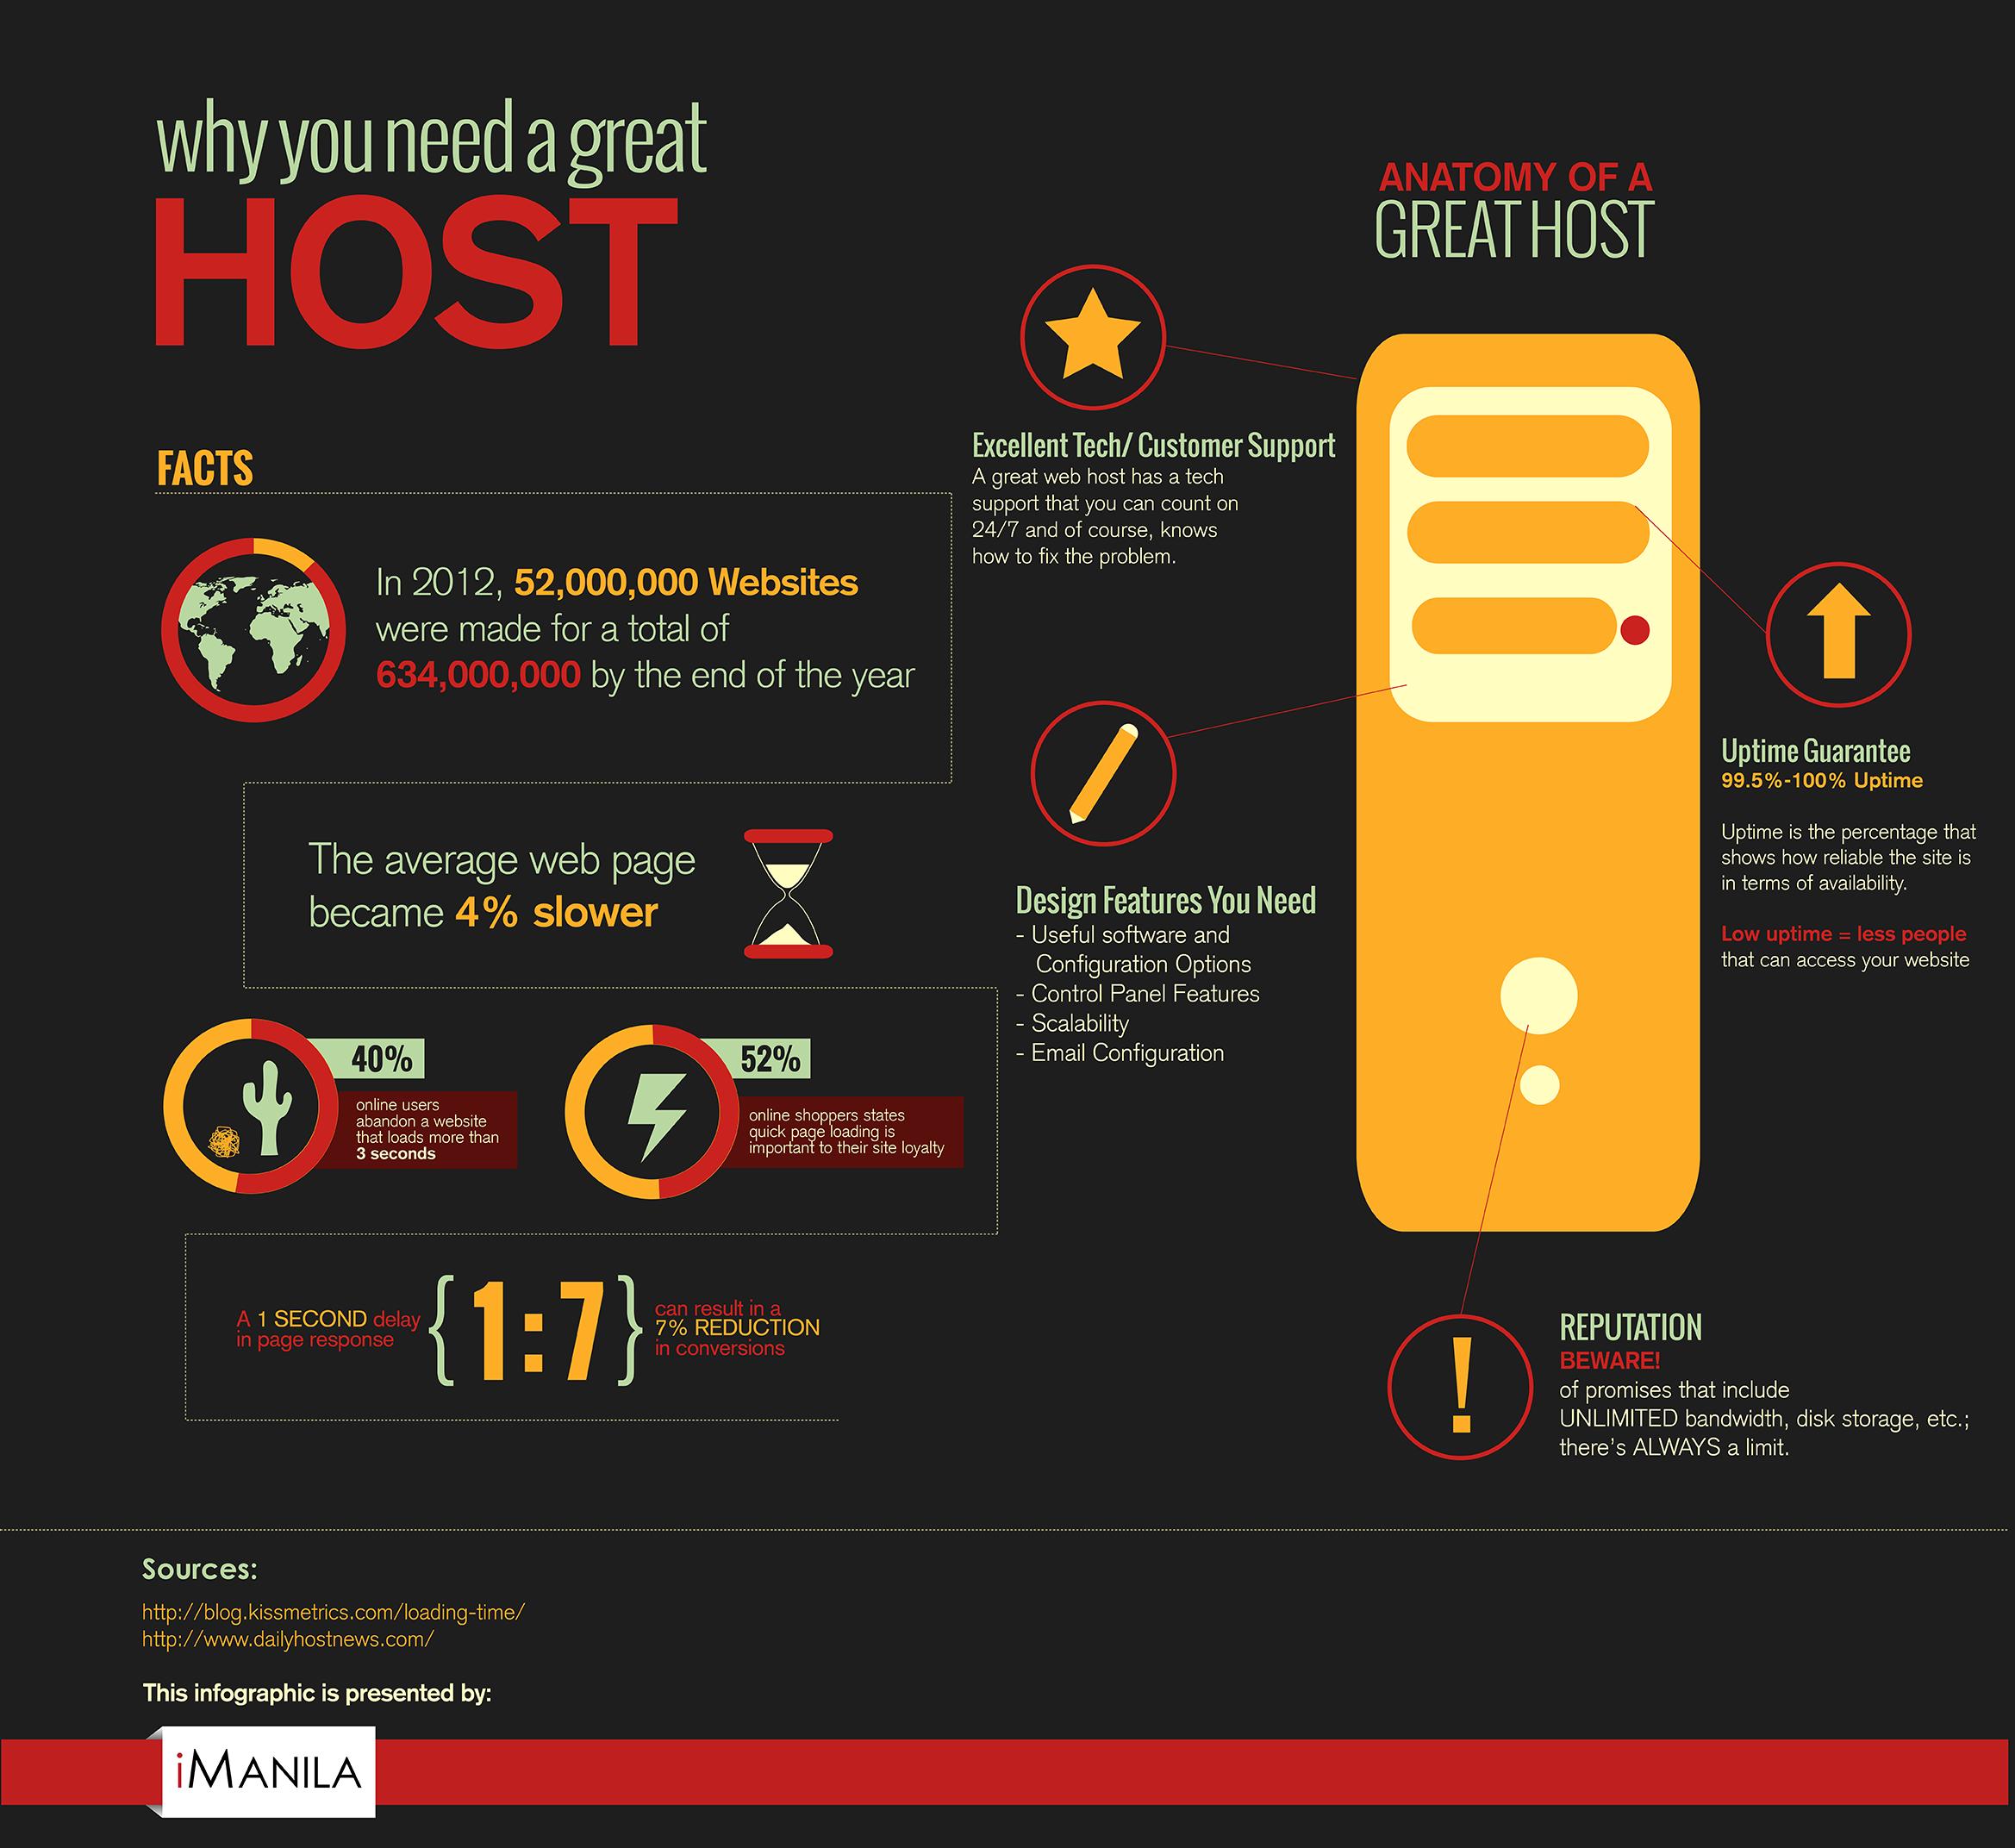 Why you need a great HOST Digital marketing agency, Web